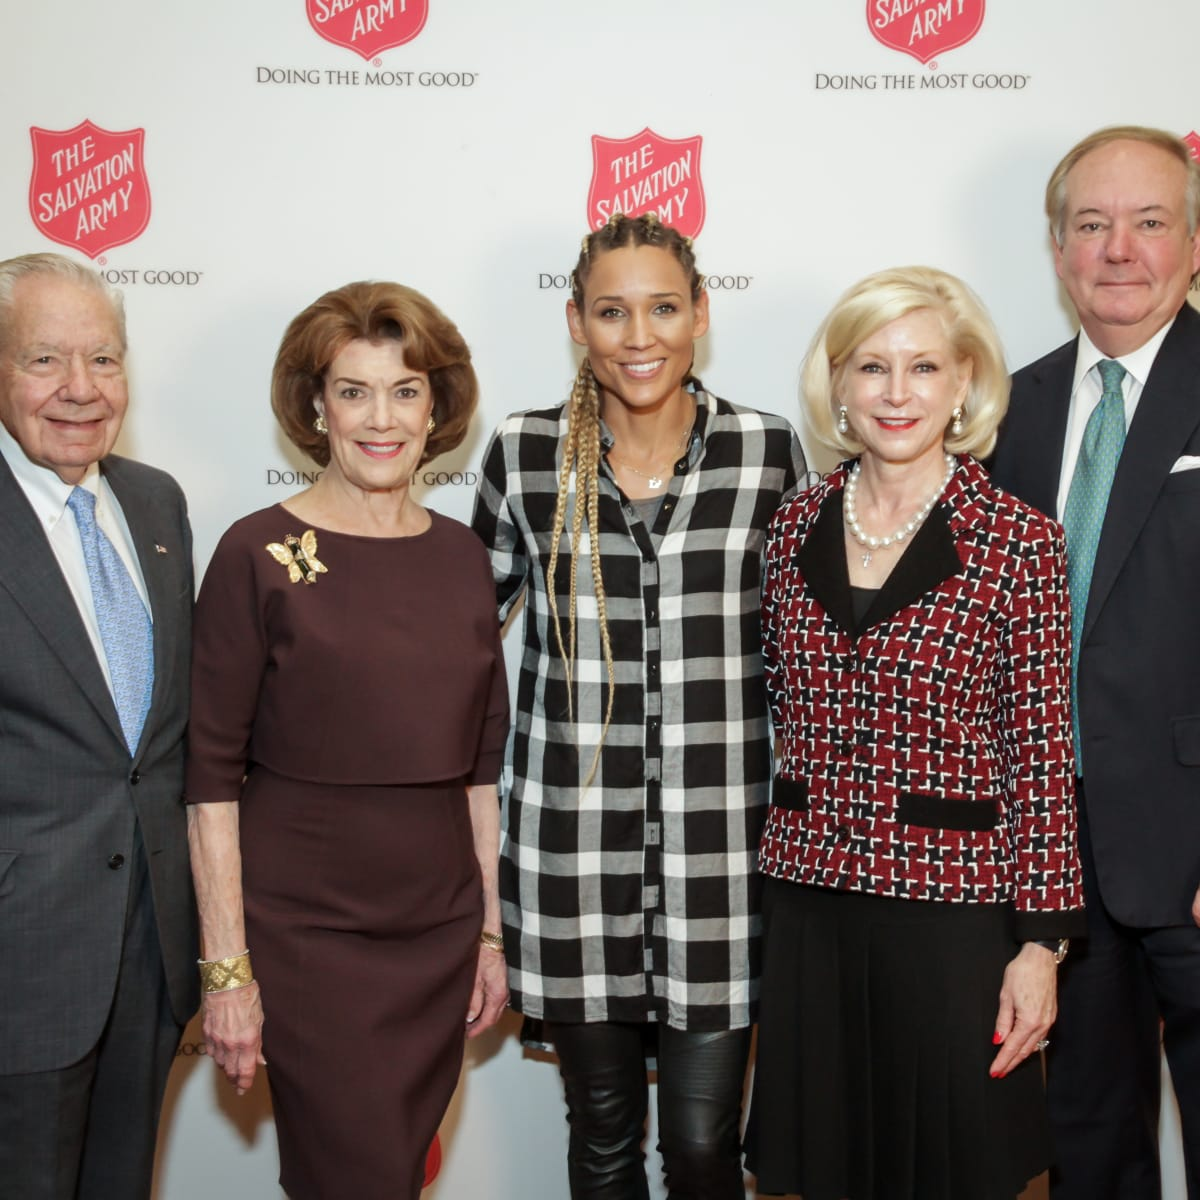 News, Shelby, Salvation Army luncheon, Nov. 2015, Wally Wilson, Jeanie Kilroy Wilson, Lolo Jones, Ann Bookout, John Bookout